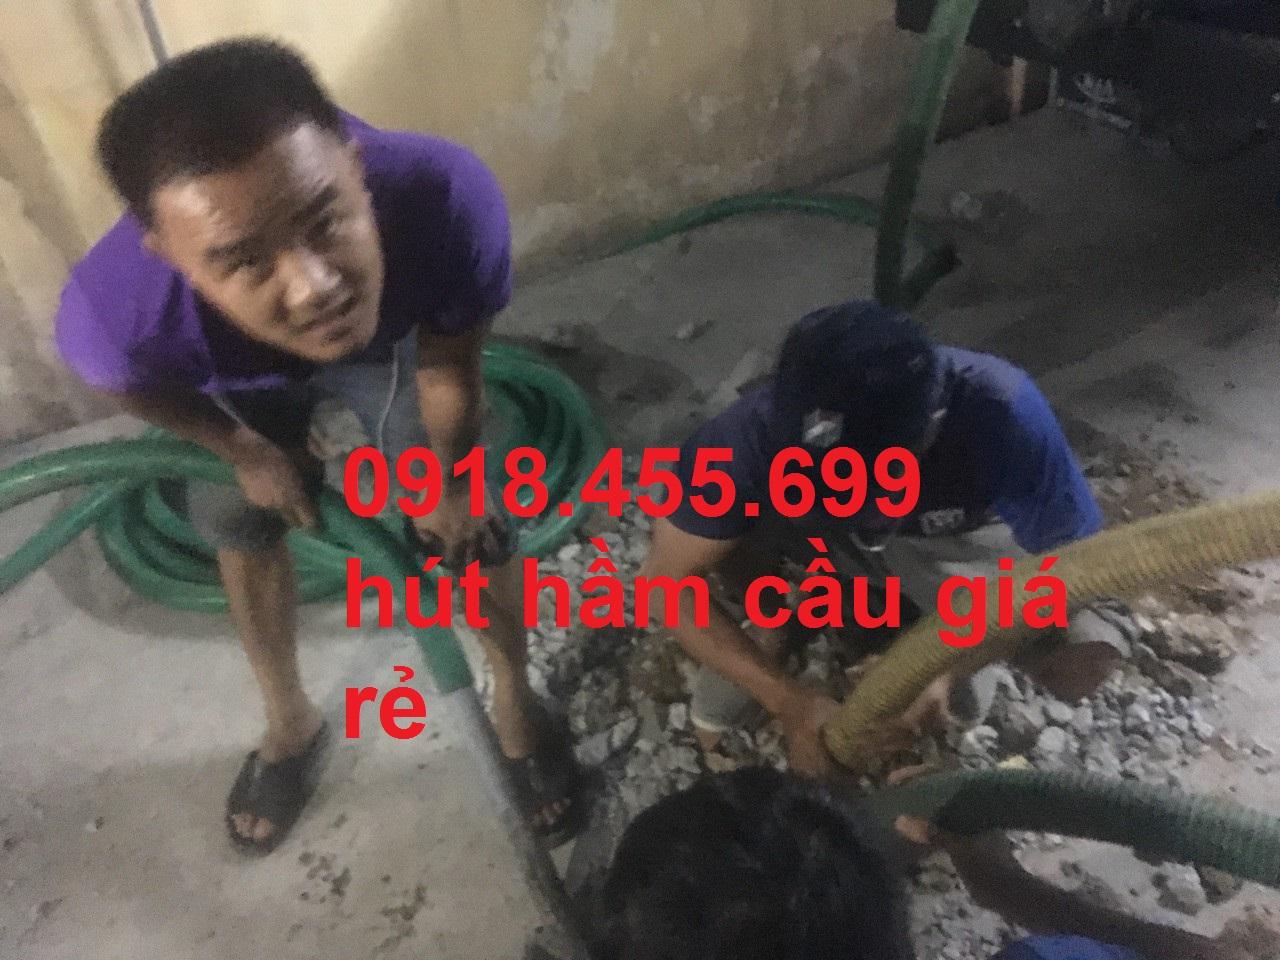 https://huthamcaugiare.com.vn/dich-vu/hut-ham-cau-huyen-can-giuoc-0967488188.html